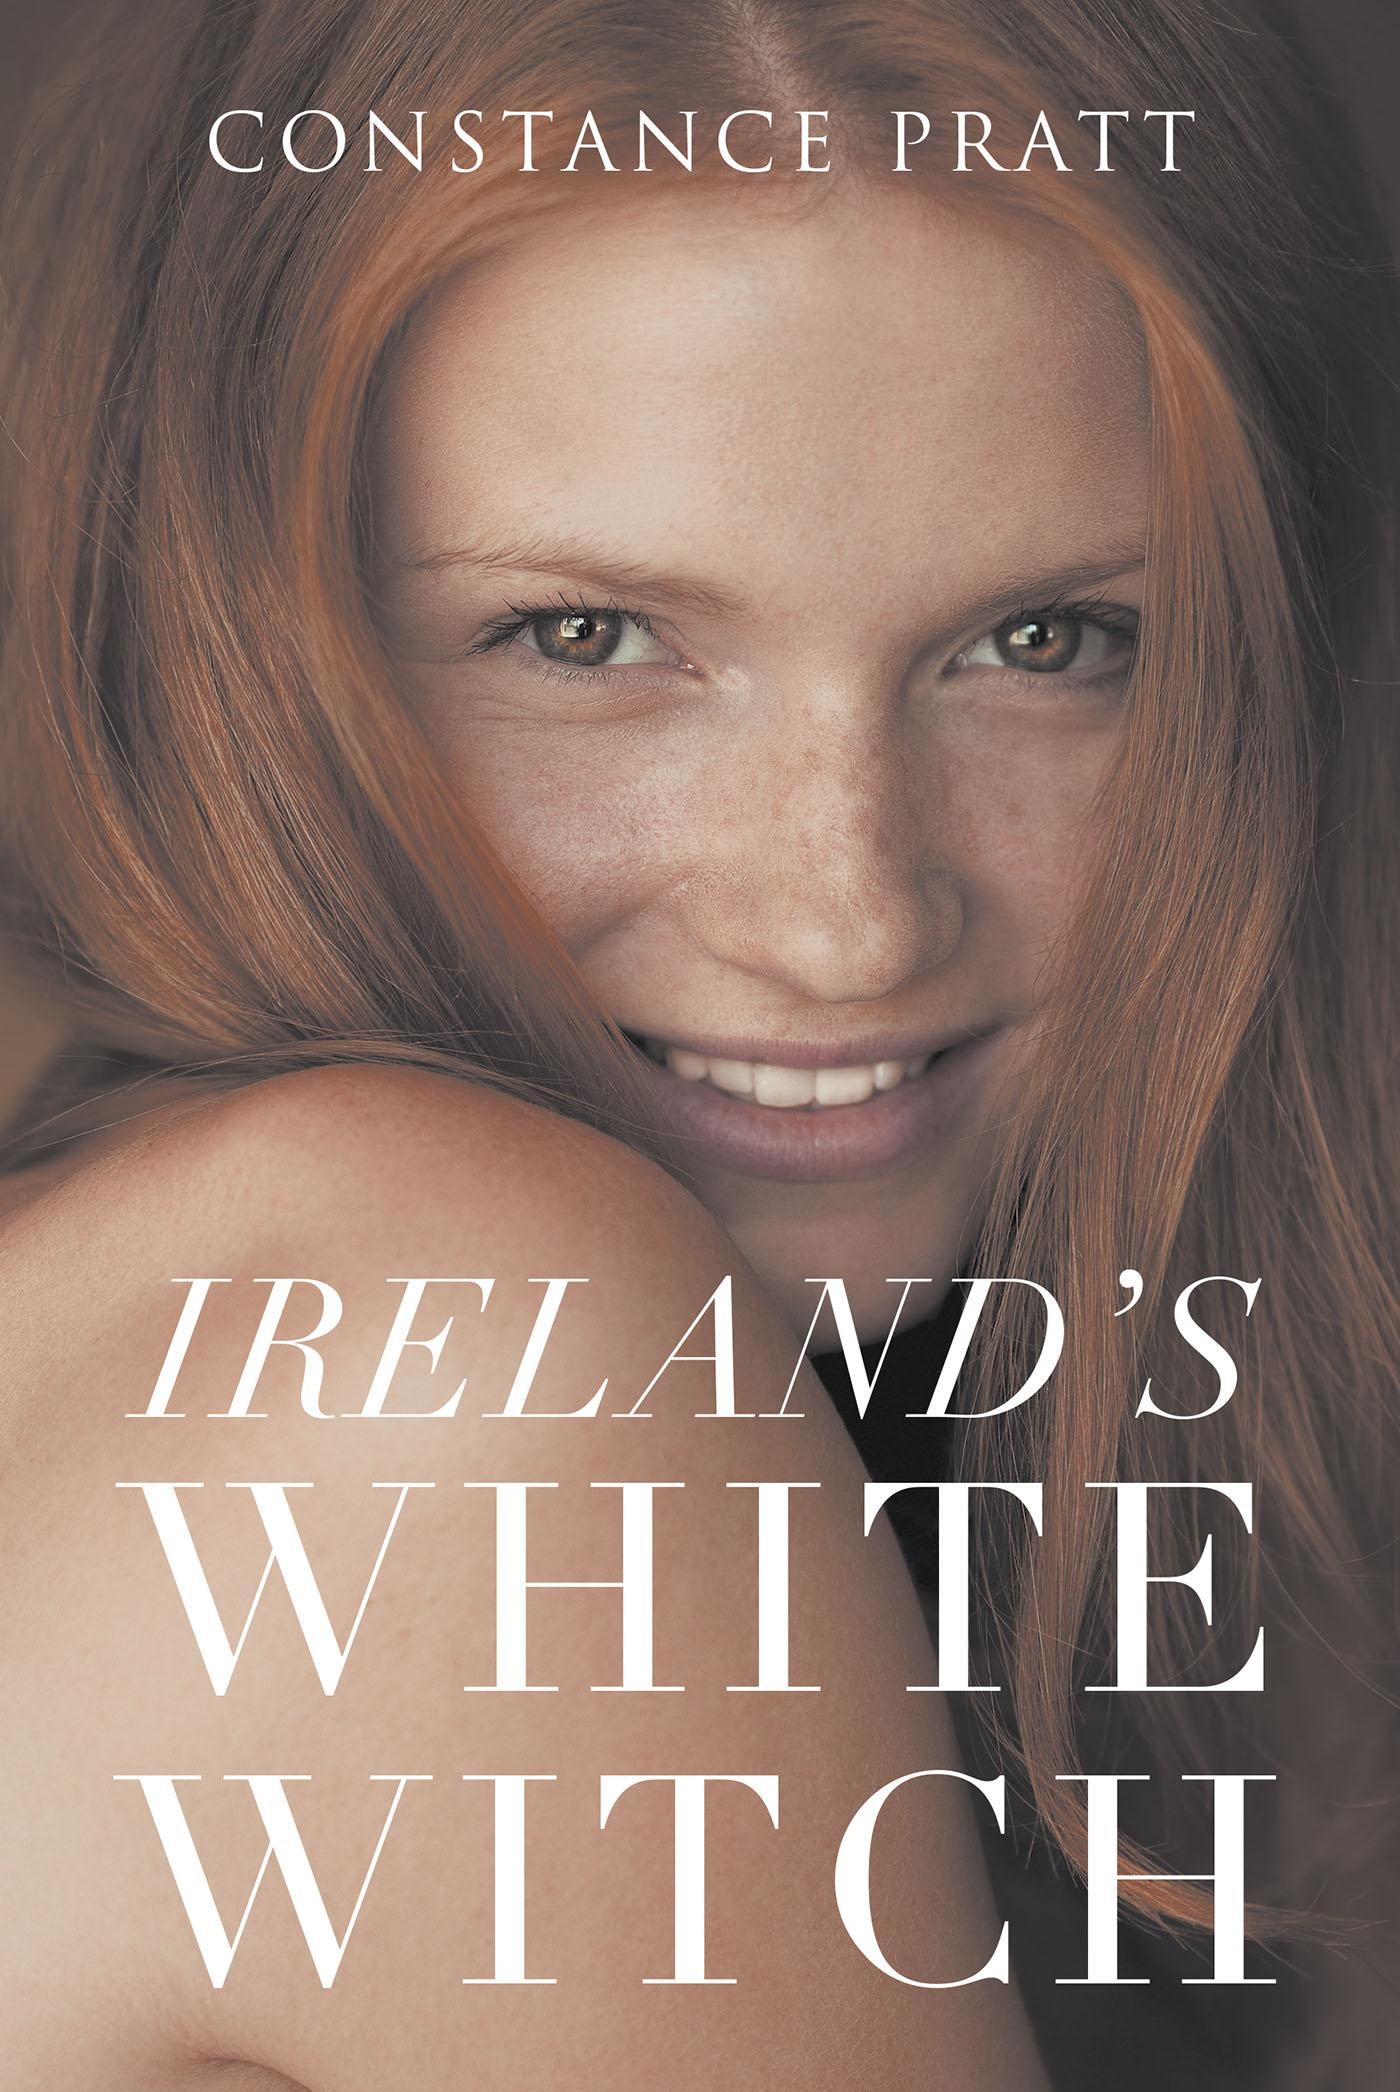 Ireland's White Witch